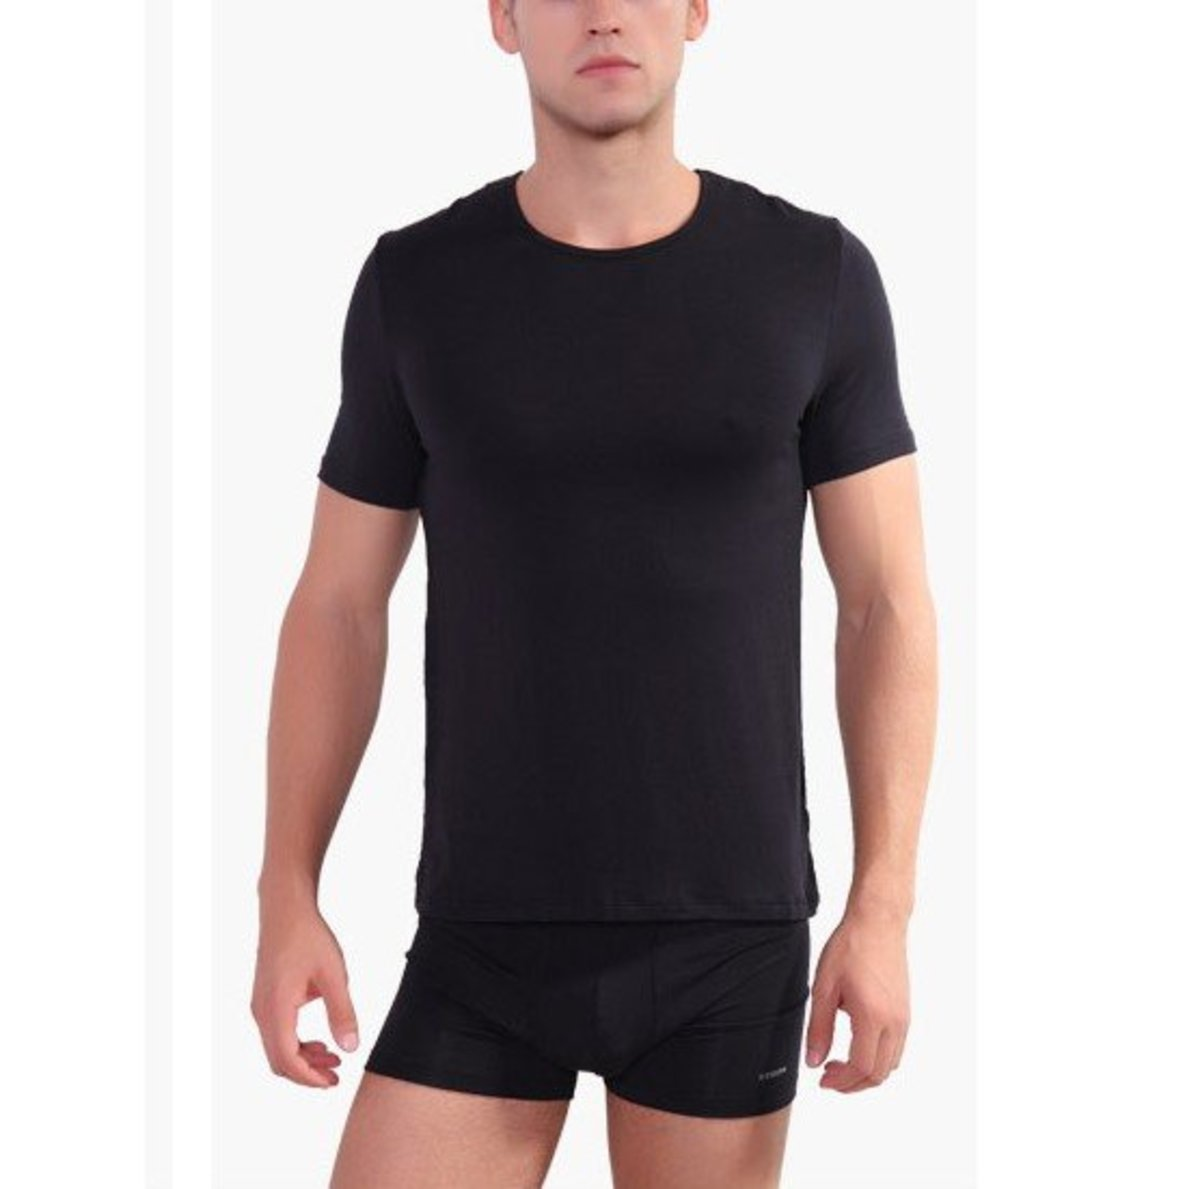 Men's Modal Short Sleeve Round-Neck Top